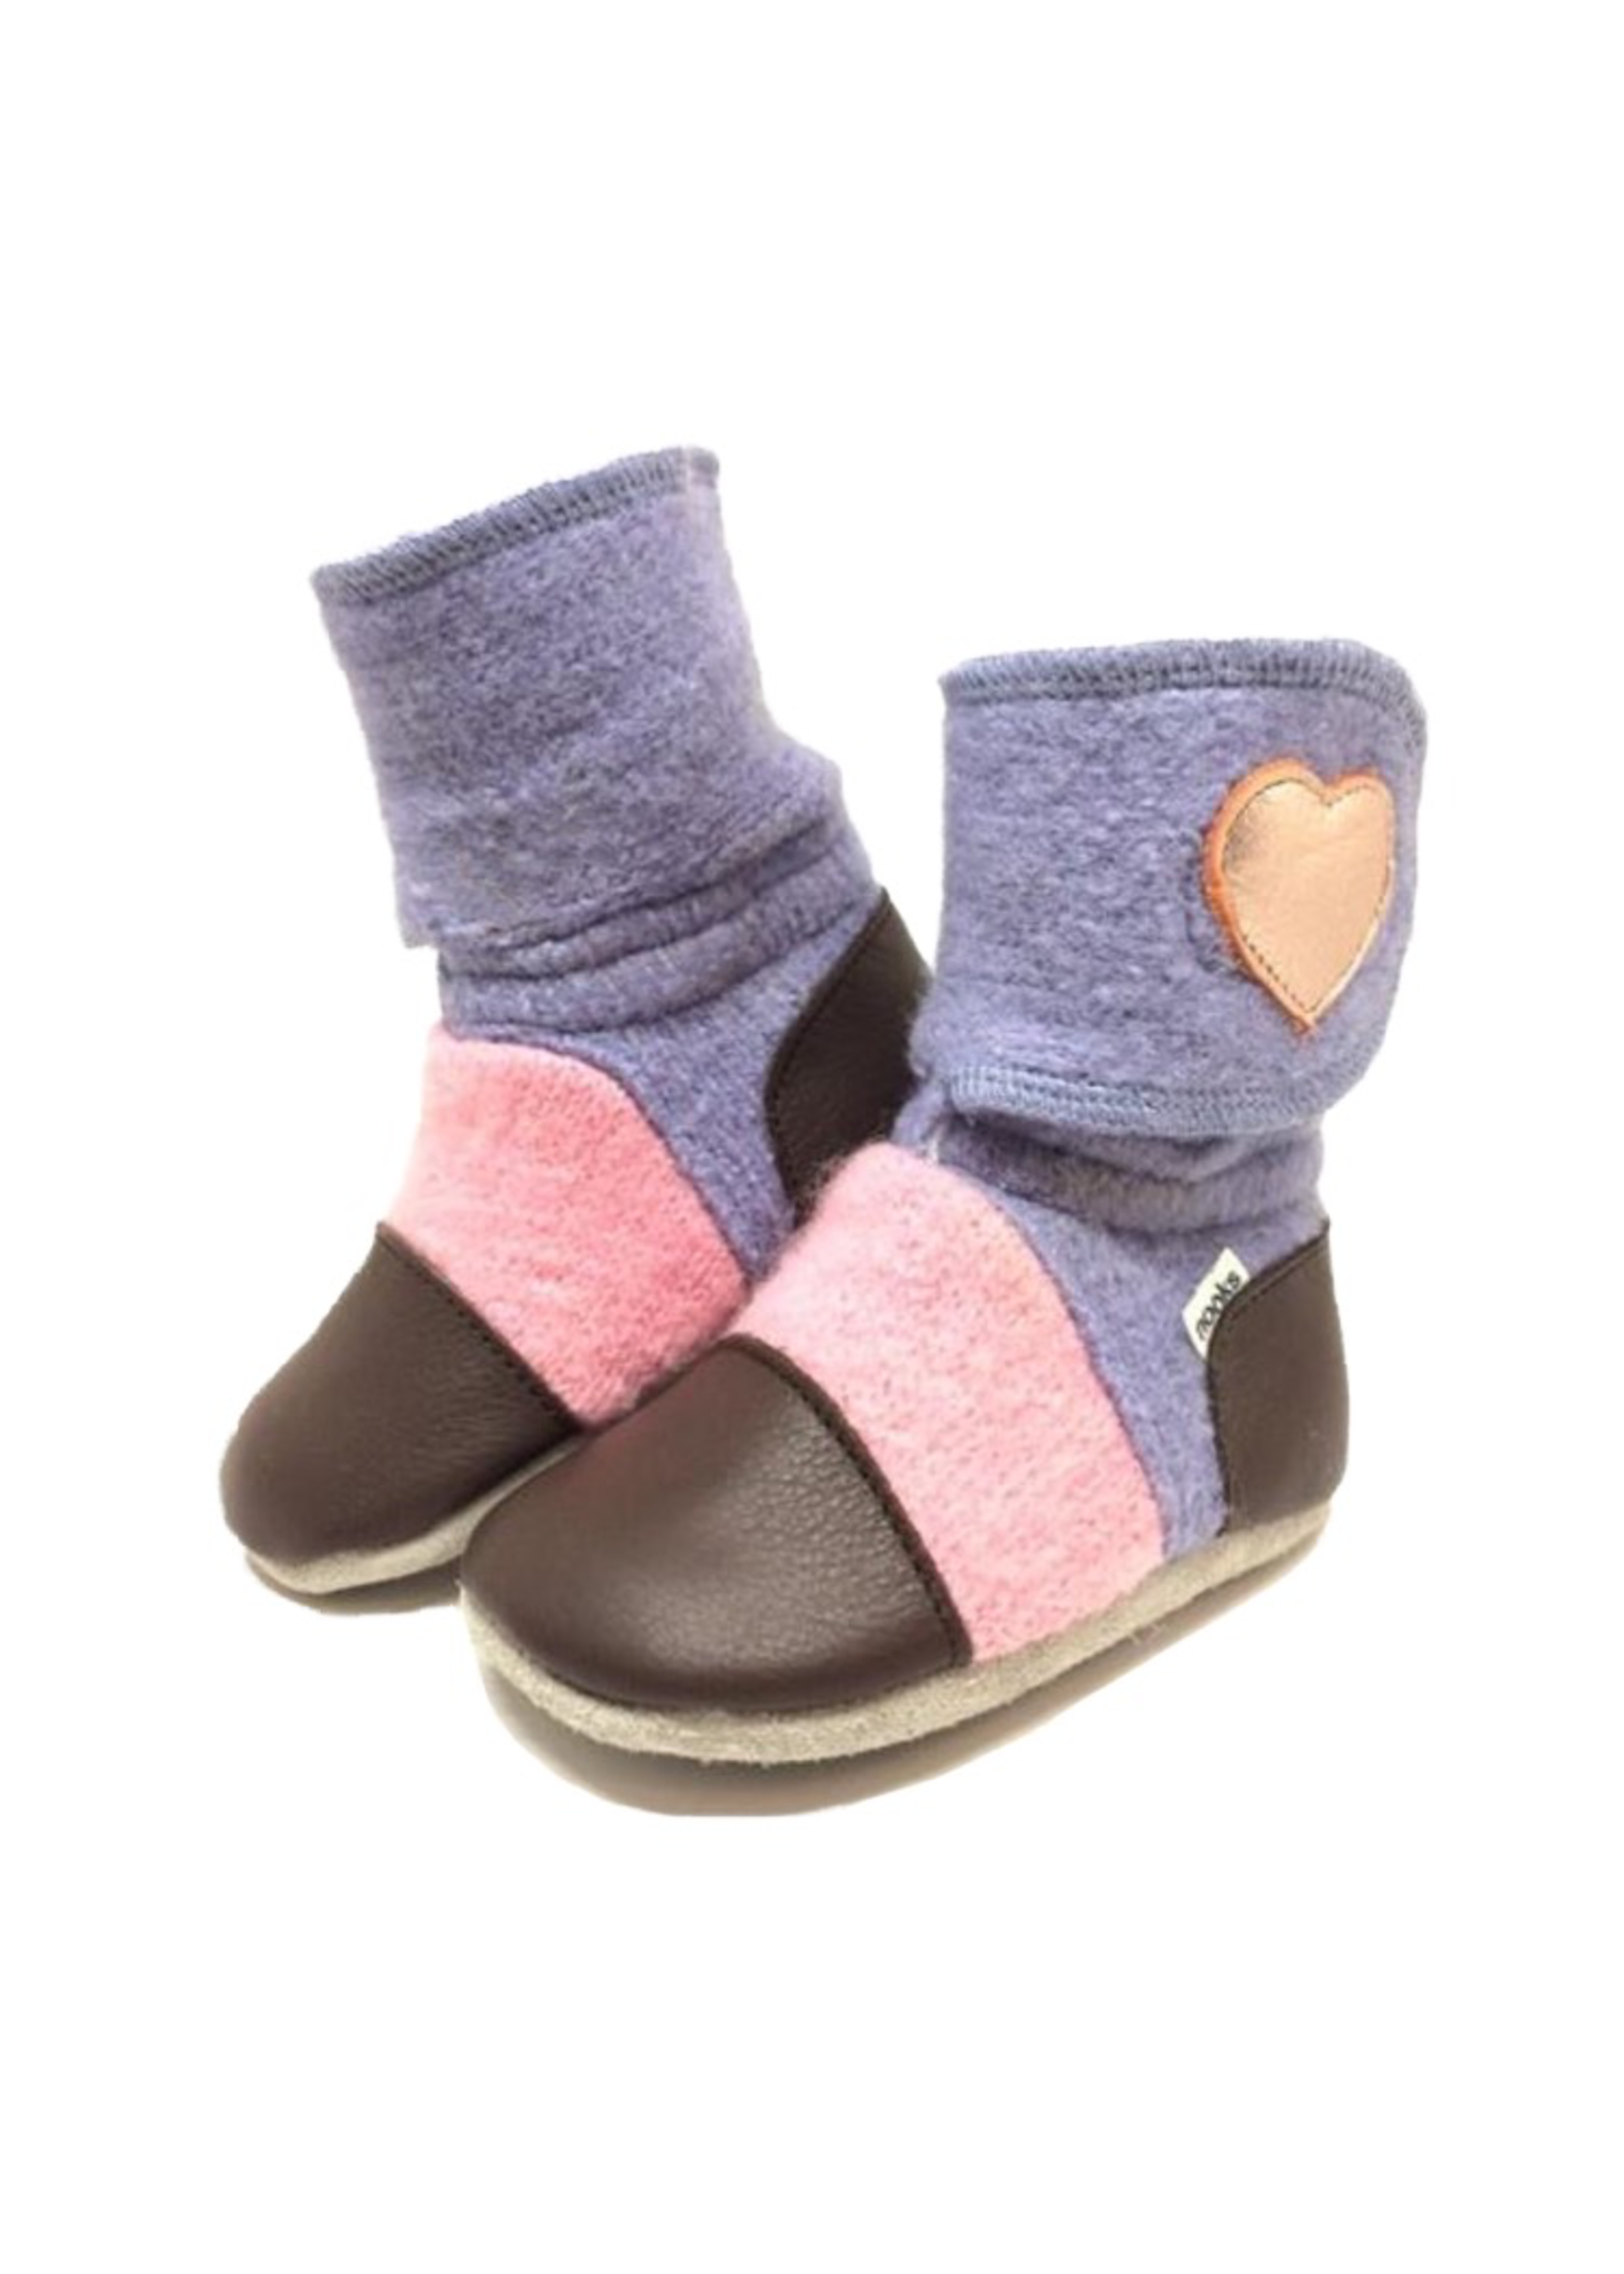 Nooks Design Nooks Design- Felted Wool Booties - P-59172